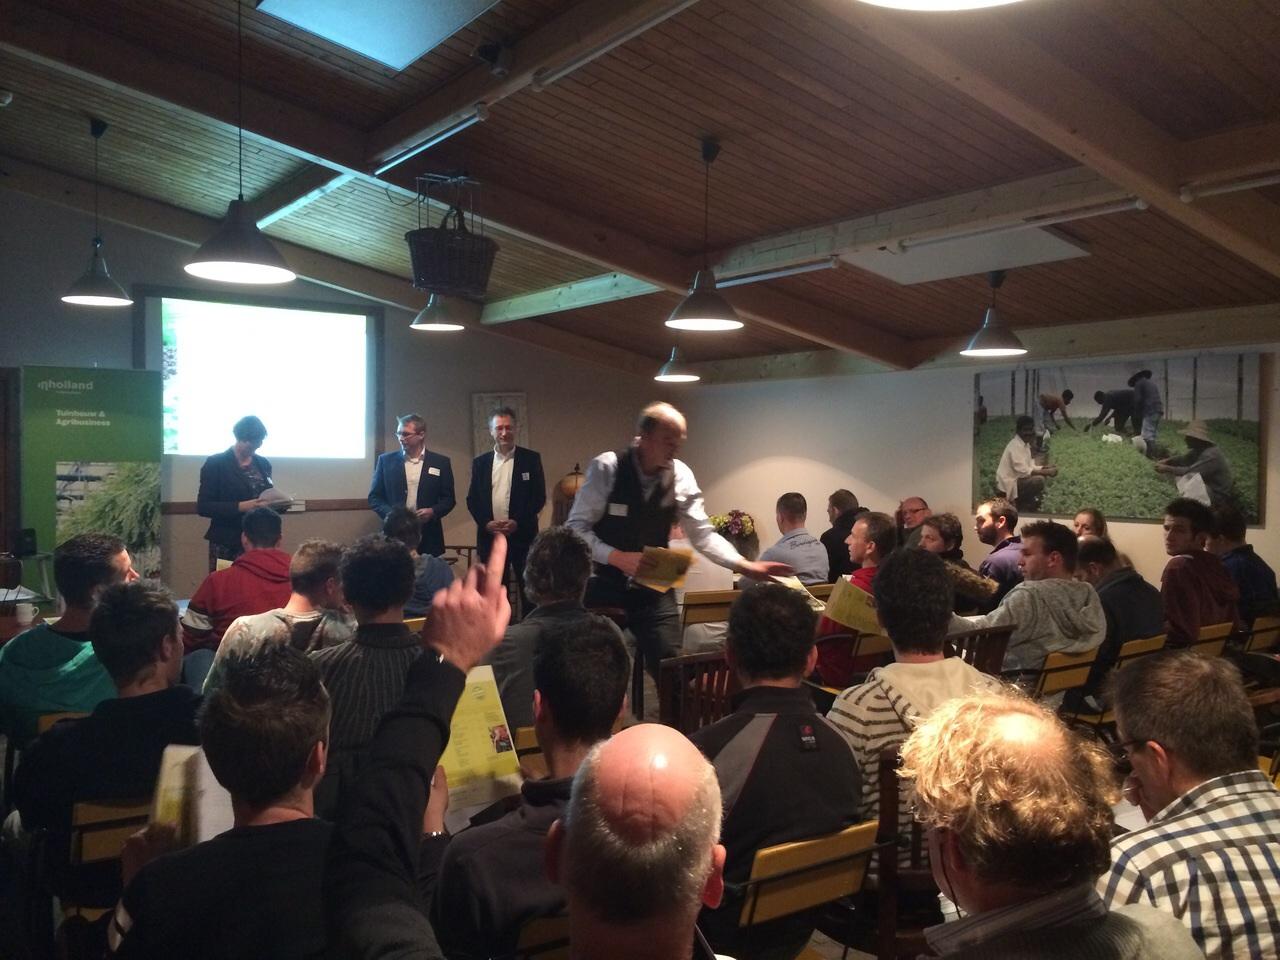 Bijeenkomst opleiding hbo teeltspecialist groot succes for Opleiding tuinarchitectuur hbo